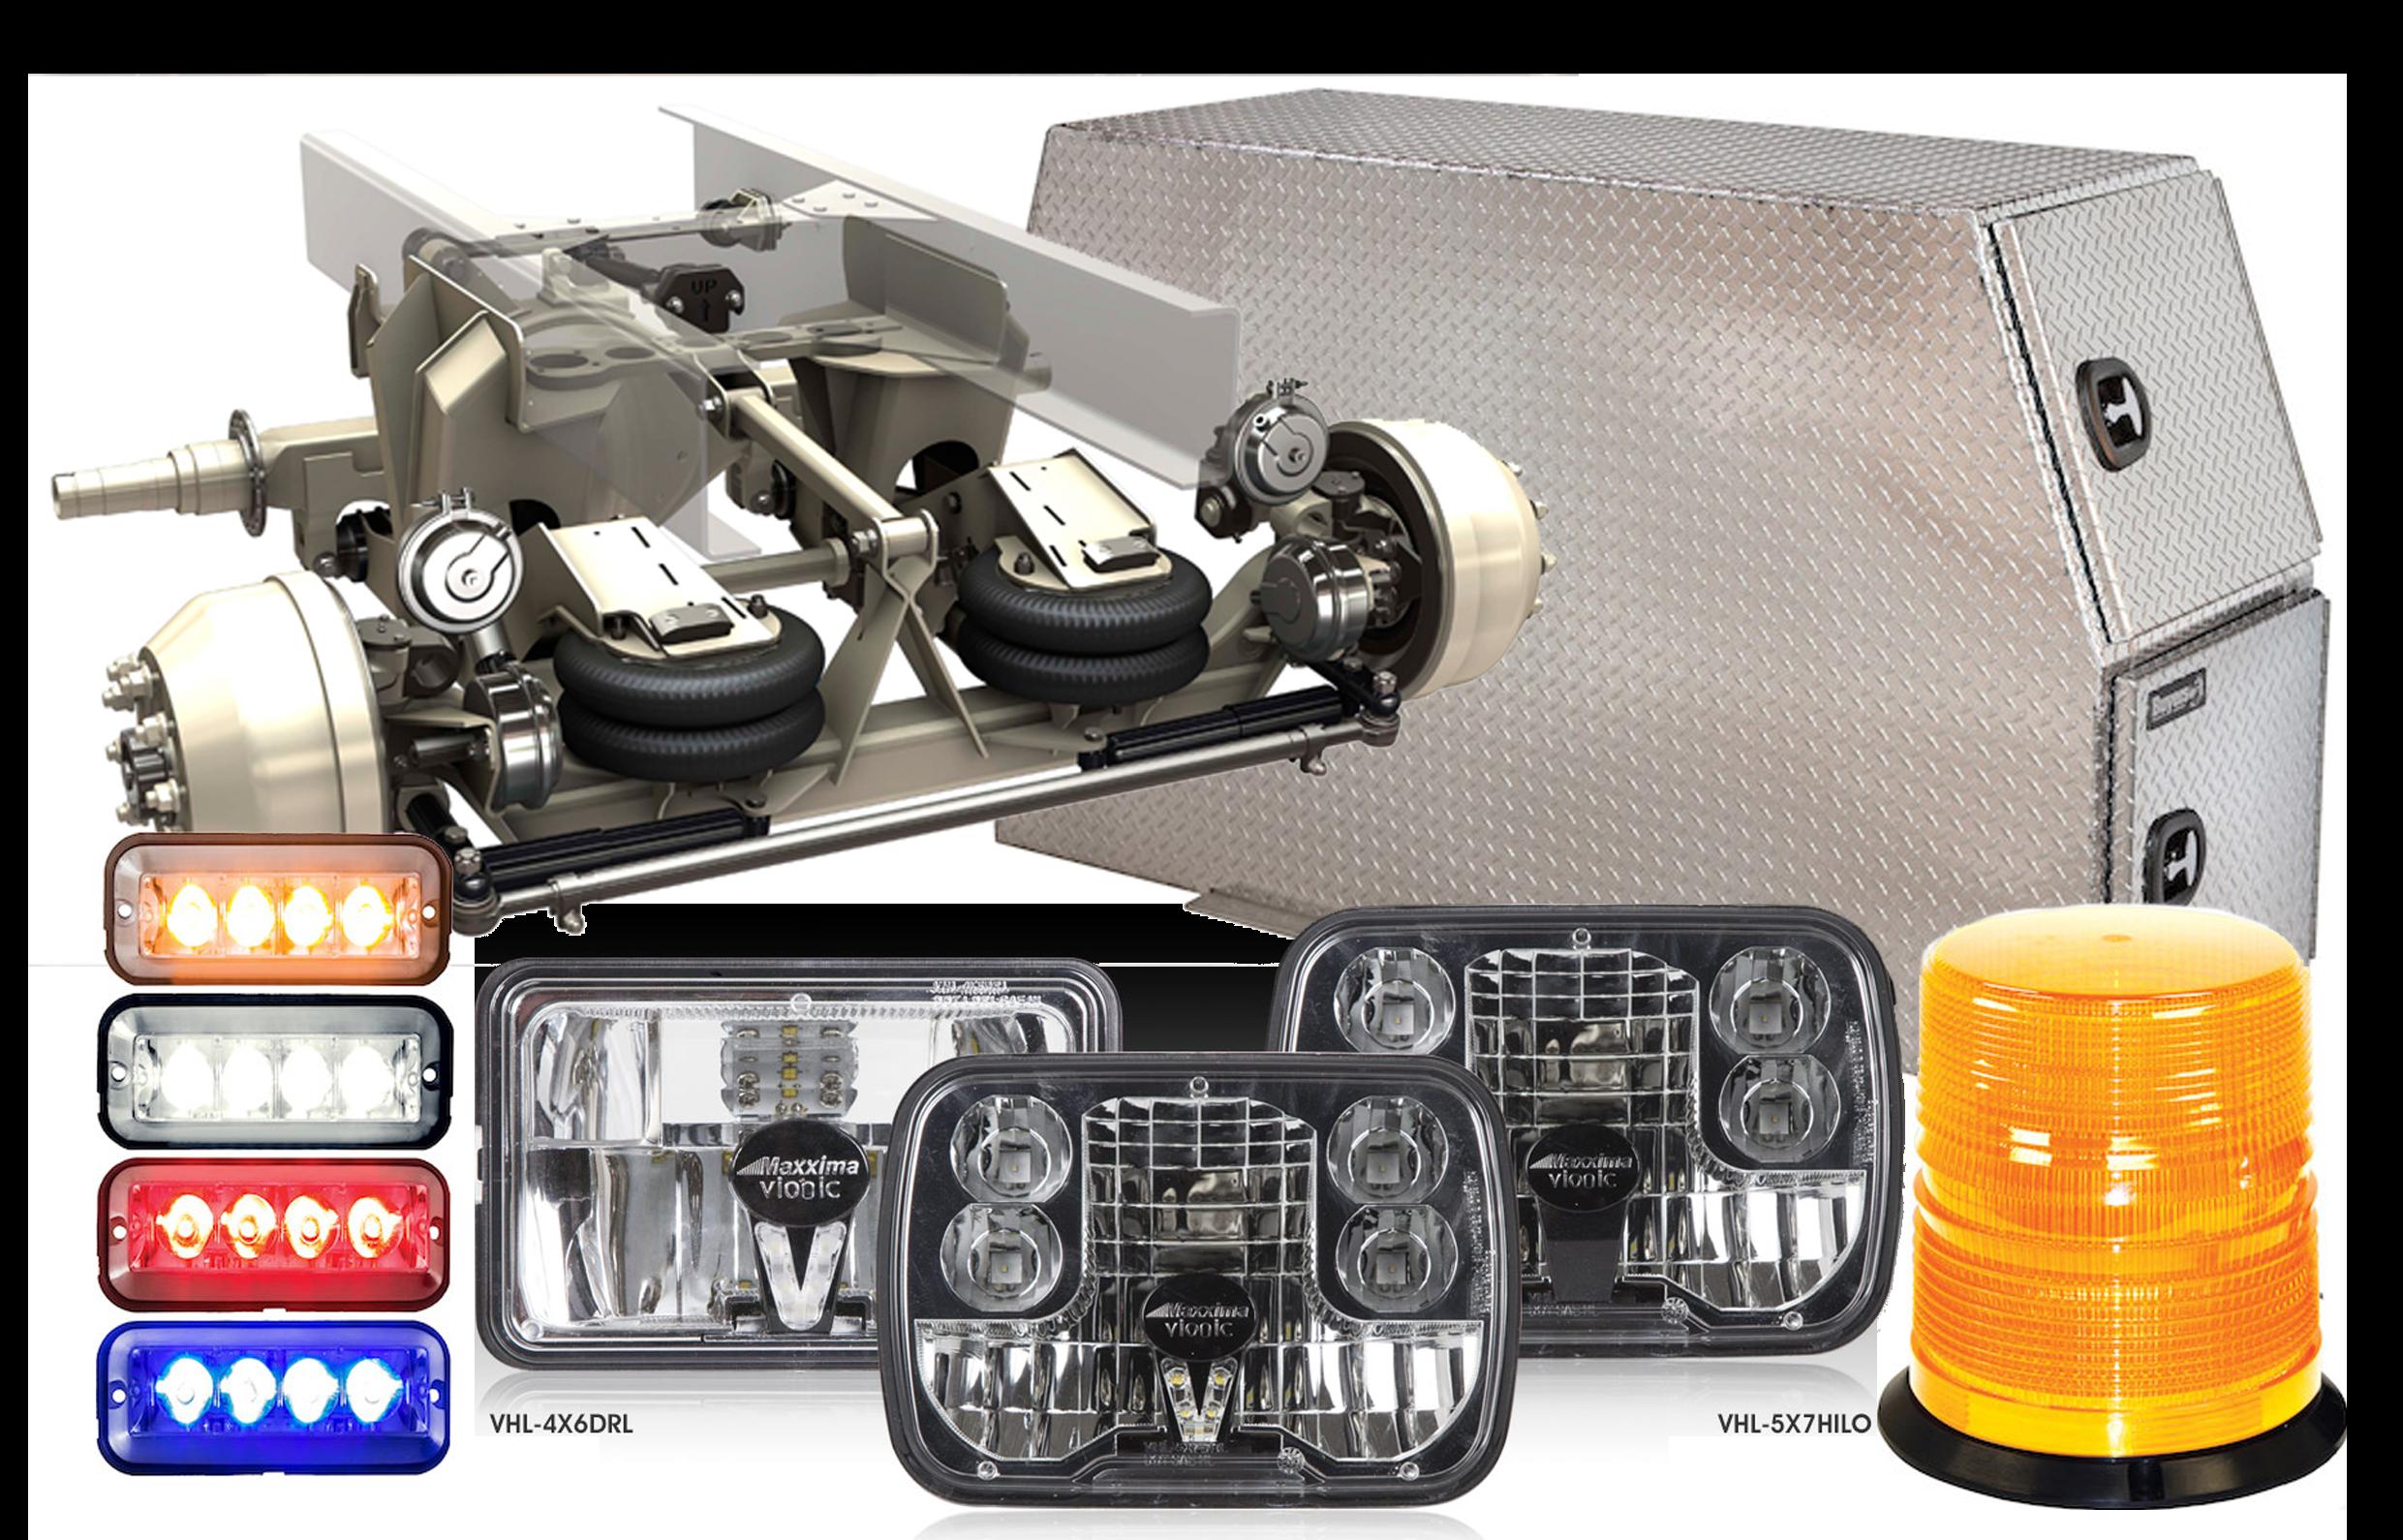 Truck Trailer Accessories, Lights